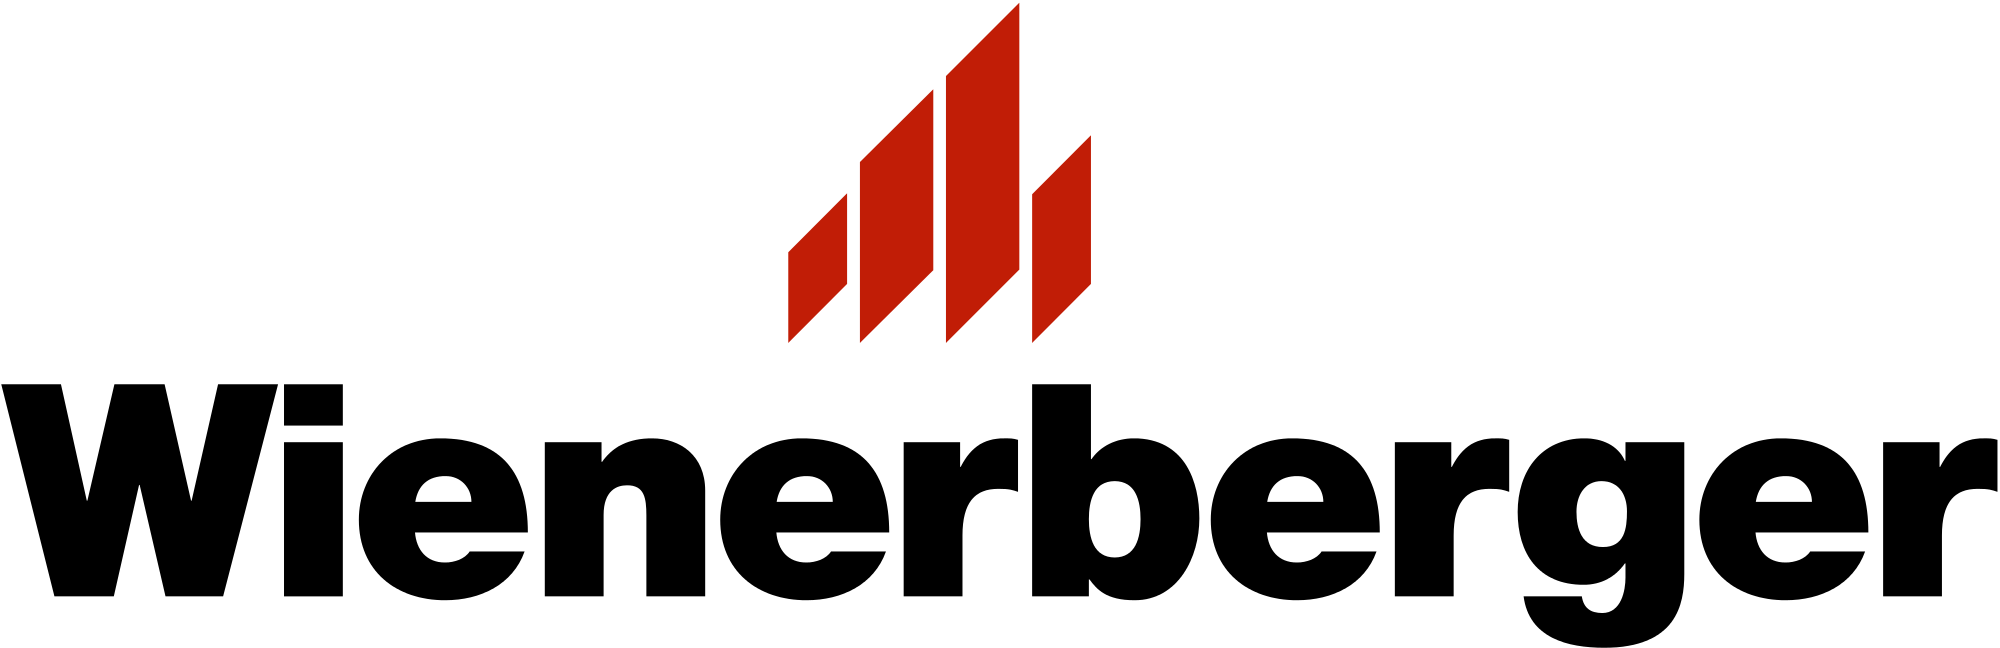 Wienerberger logo - Matériaux de construction